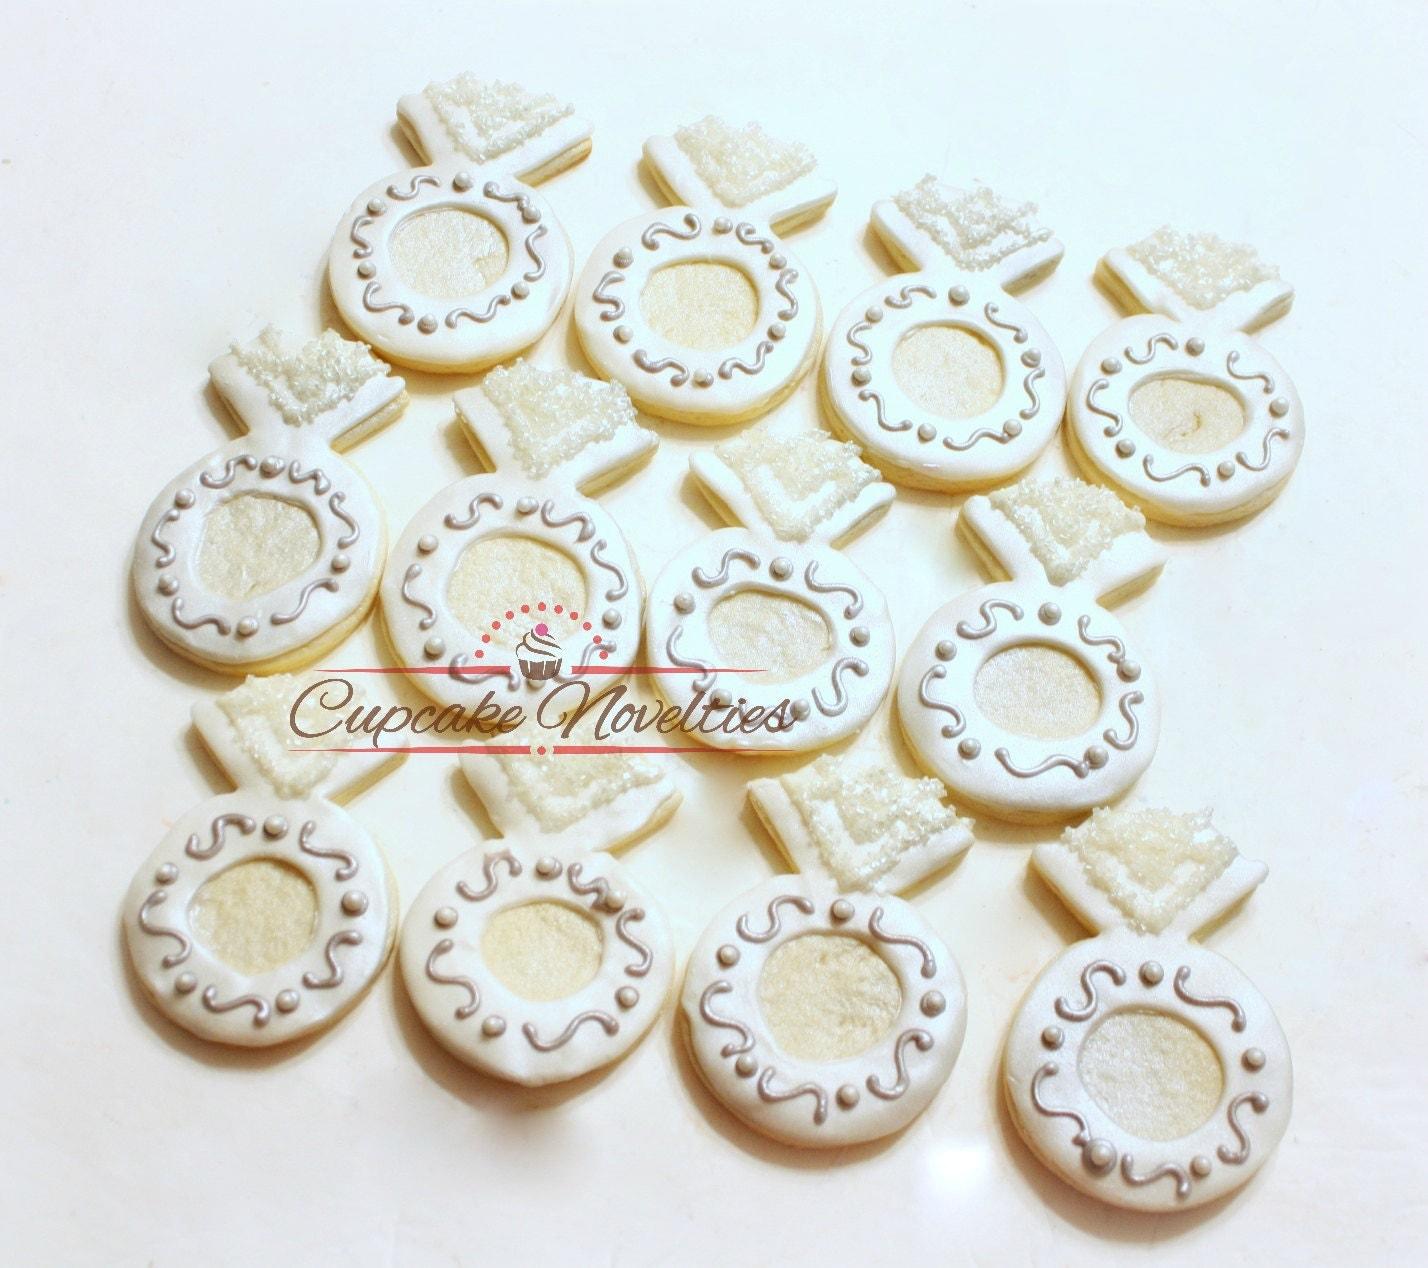 engagement ring cookies wedding cookies wedding favors bridal